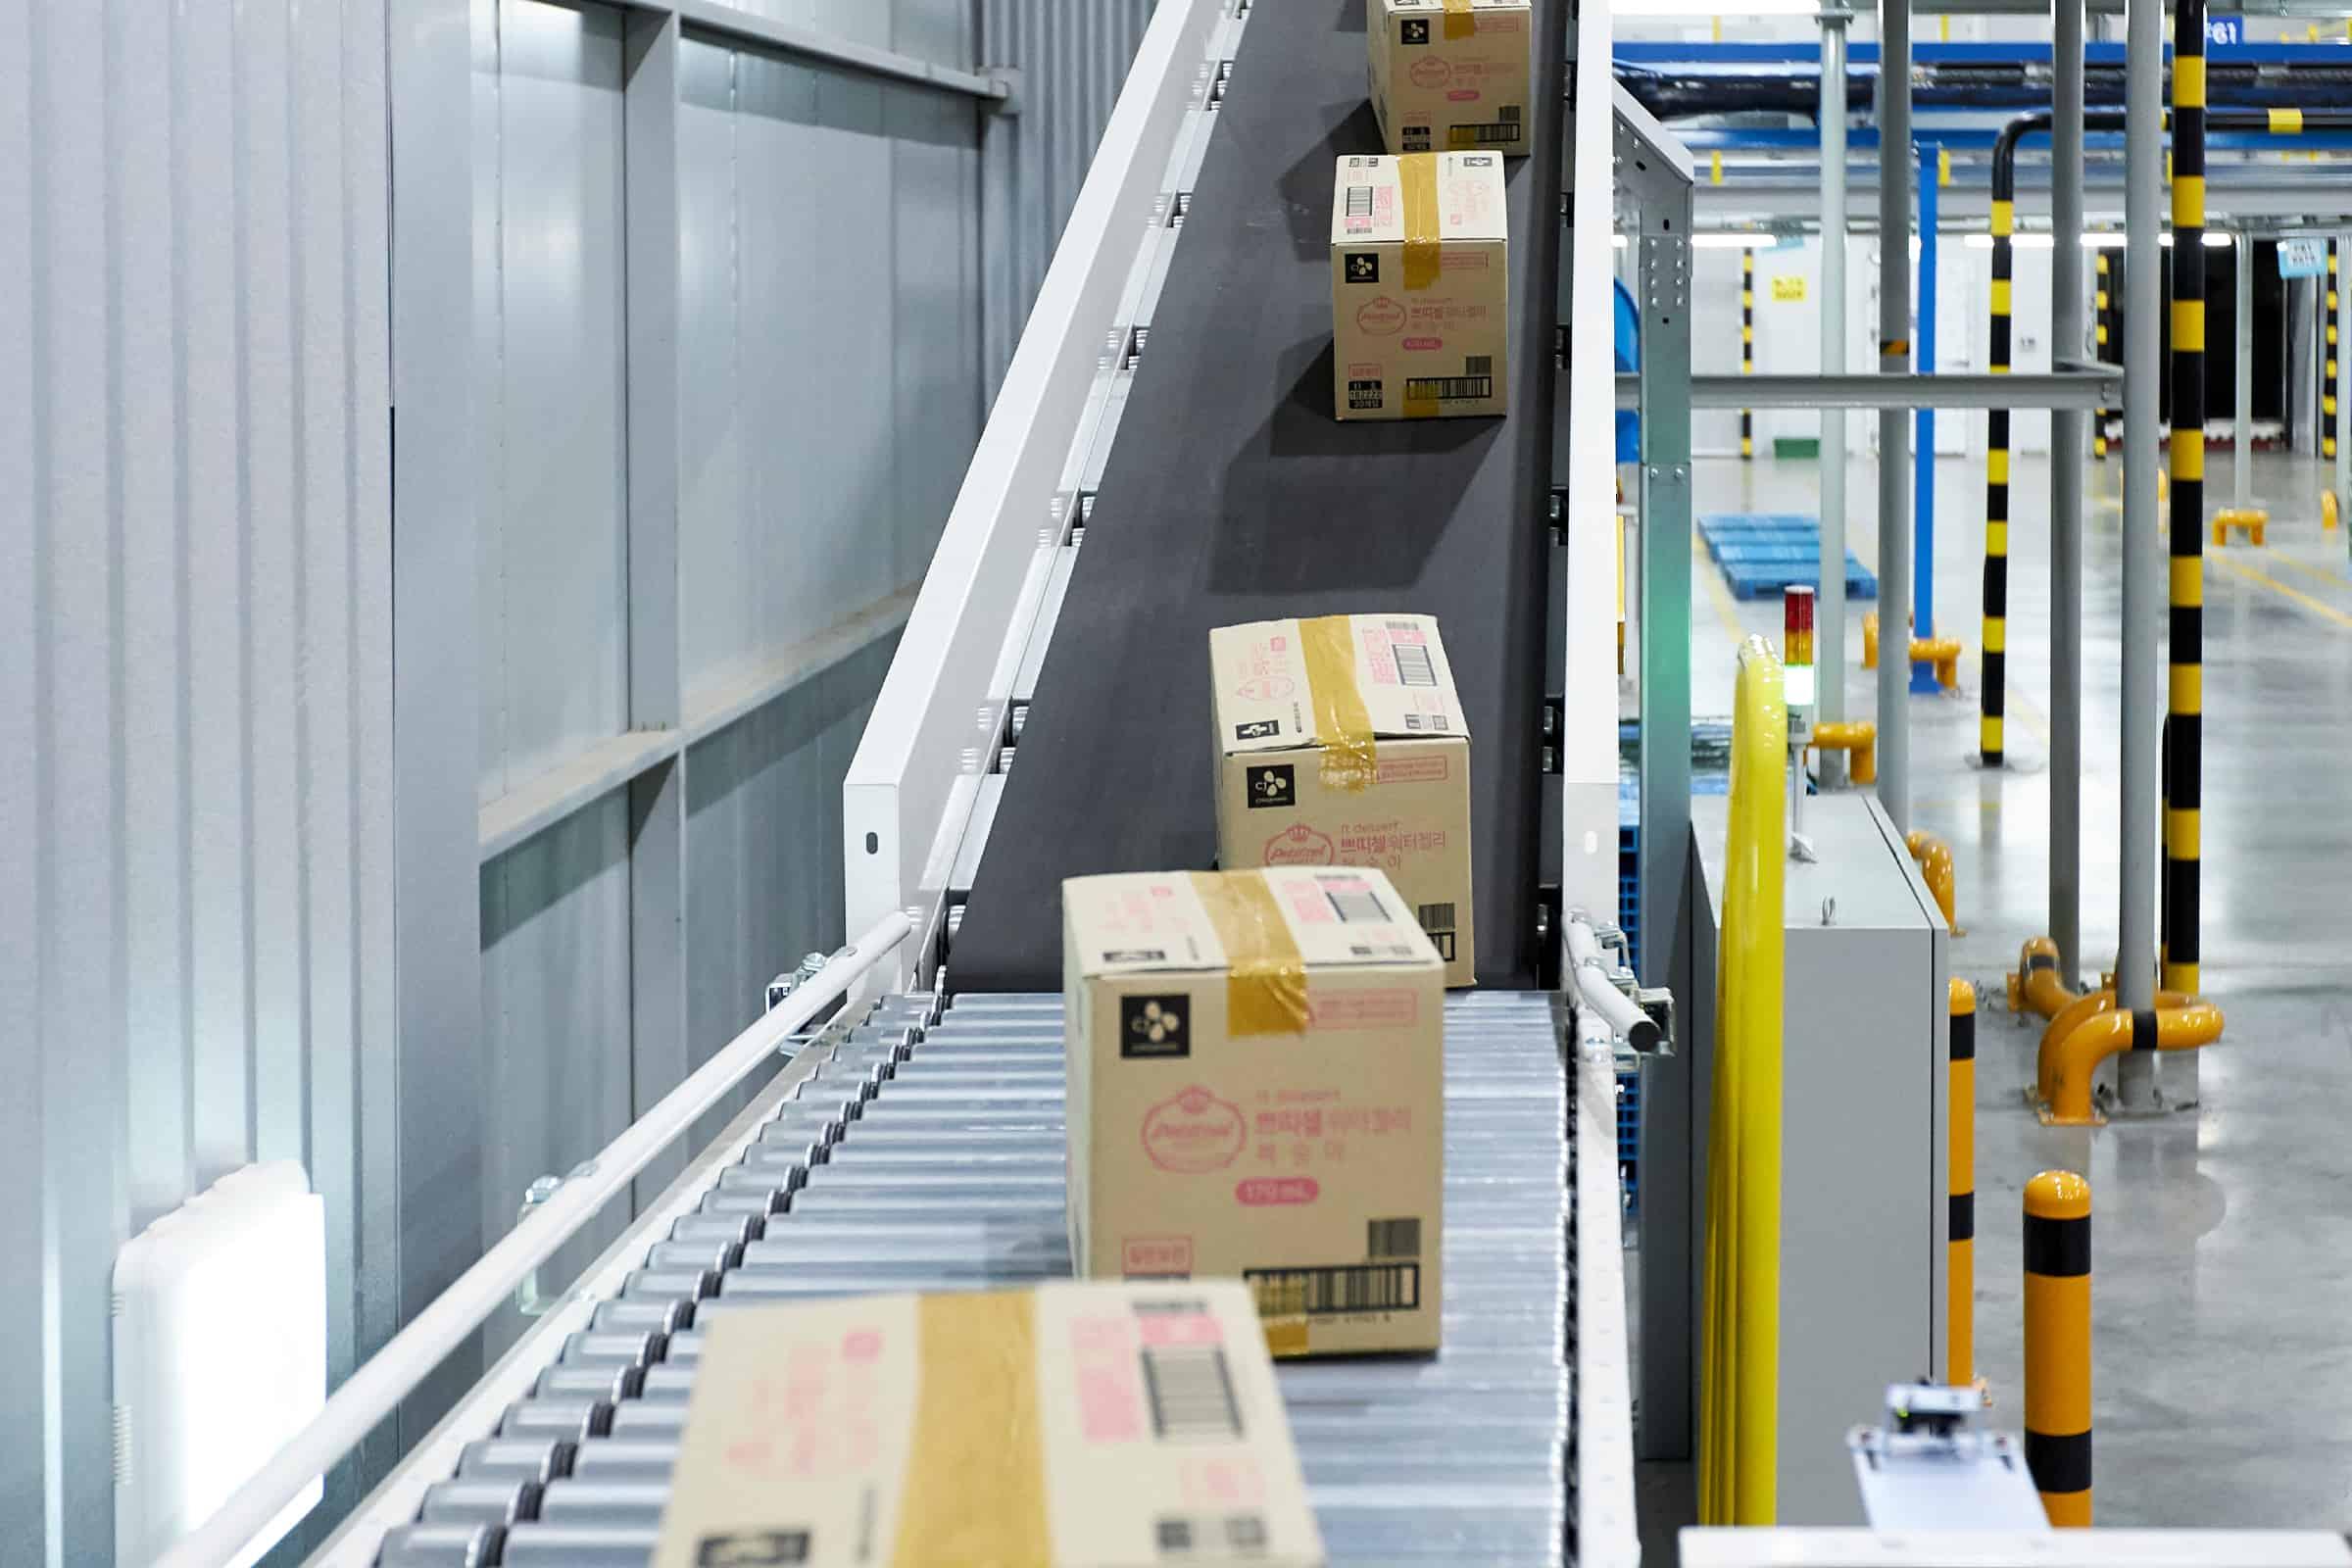 cj logistics, cj logistics america, national logistics day, supply chain